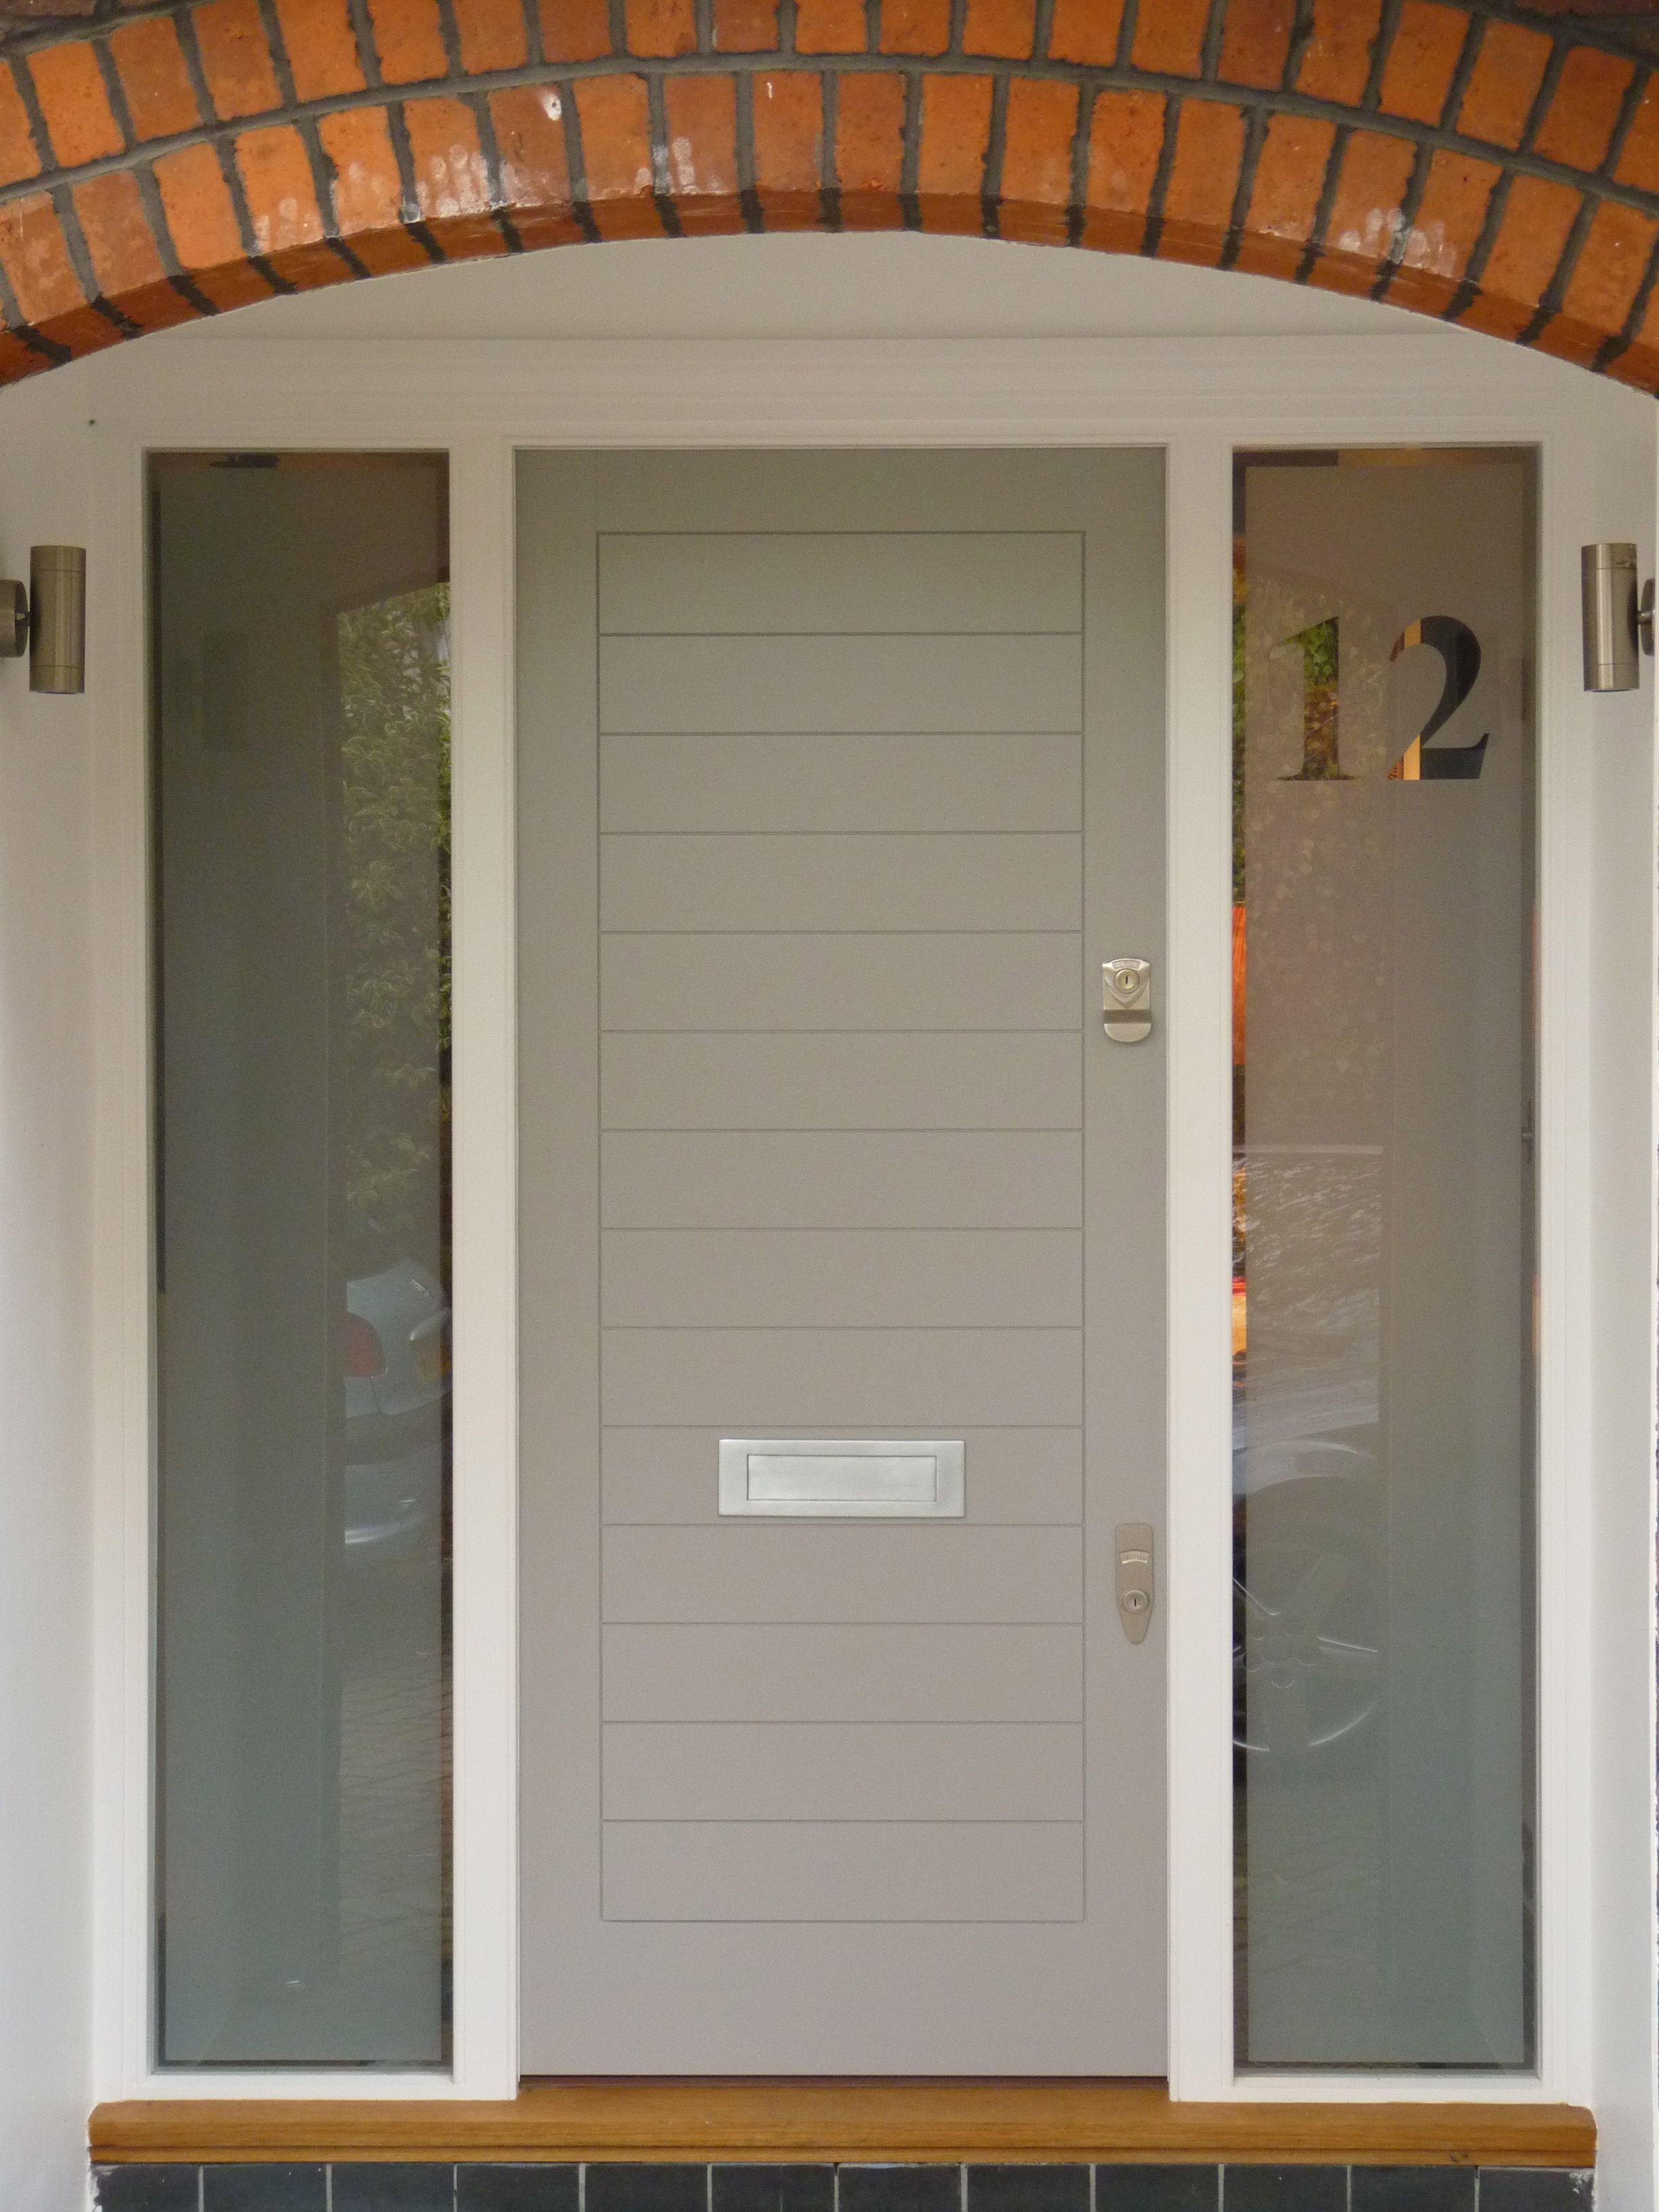 This subtle grey-sky coloured door is the epitome of contemporary chic. & This subtle grey-sky coloured door is the epitome of contemporary ... pezcame.com